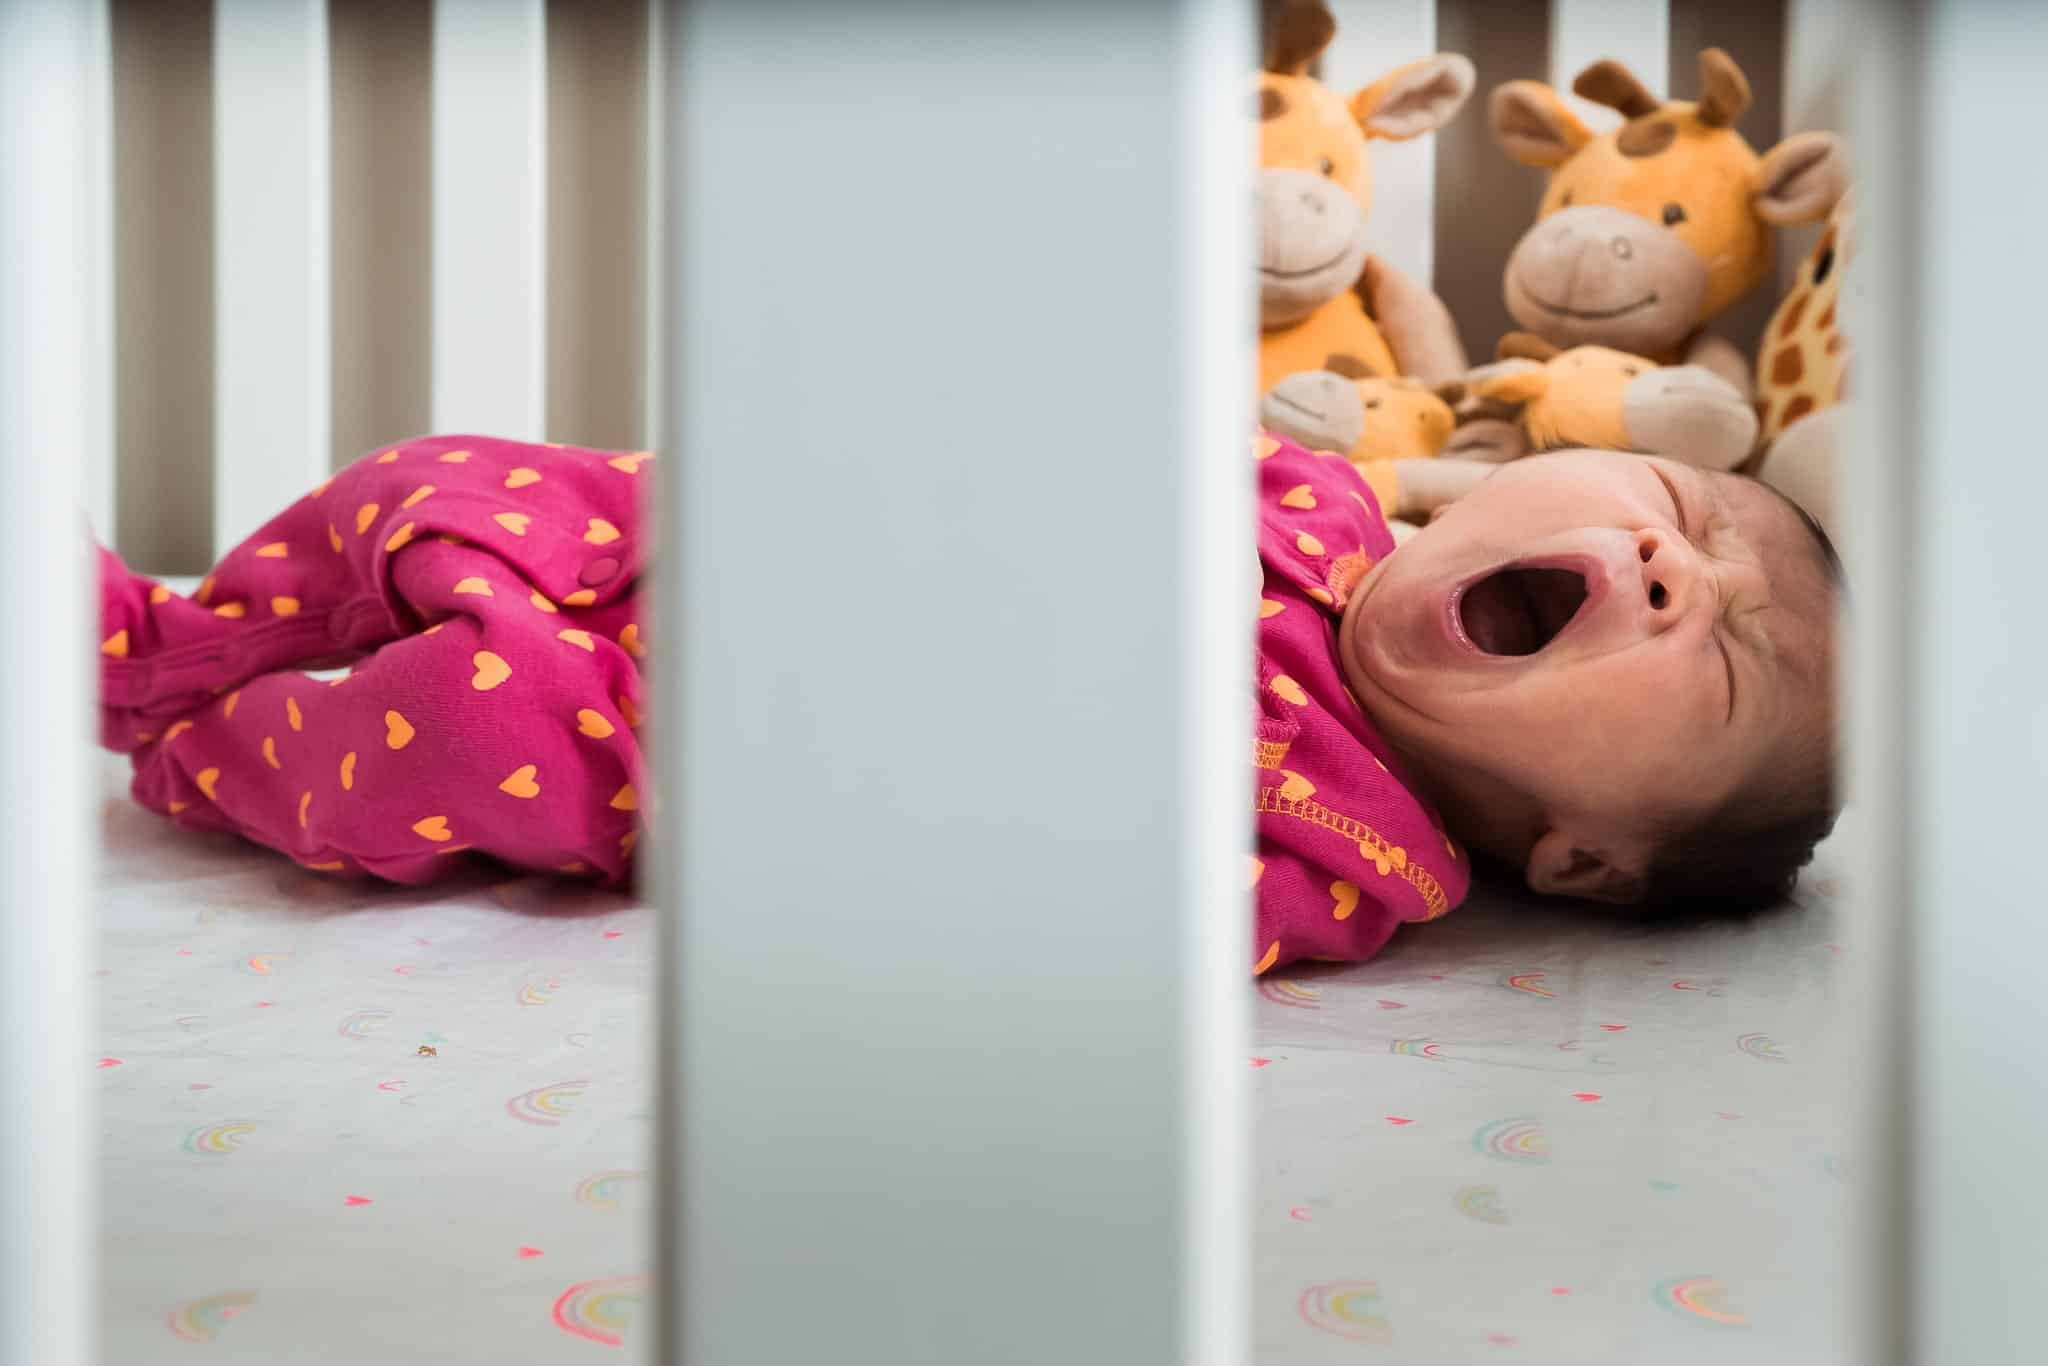 baby newborn yawning through crib bars with stuffed giraffes